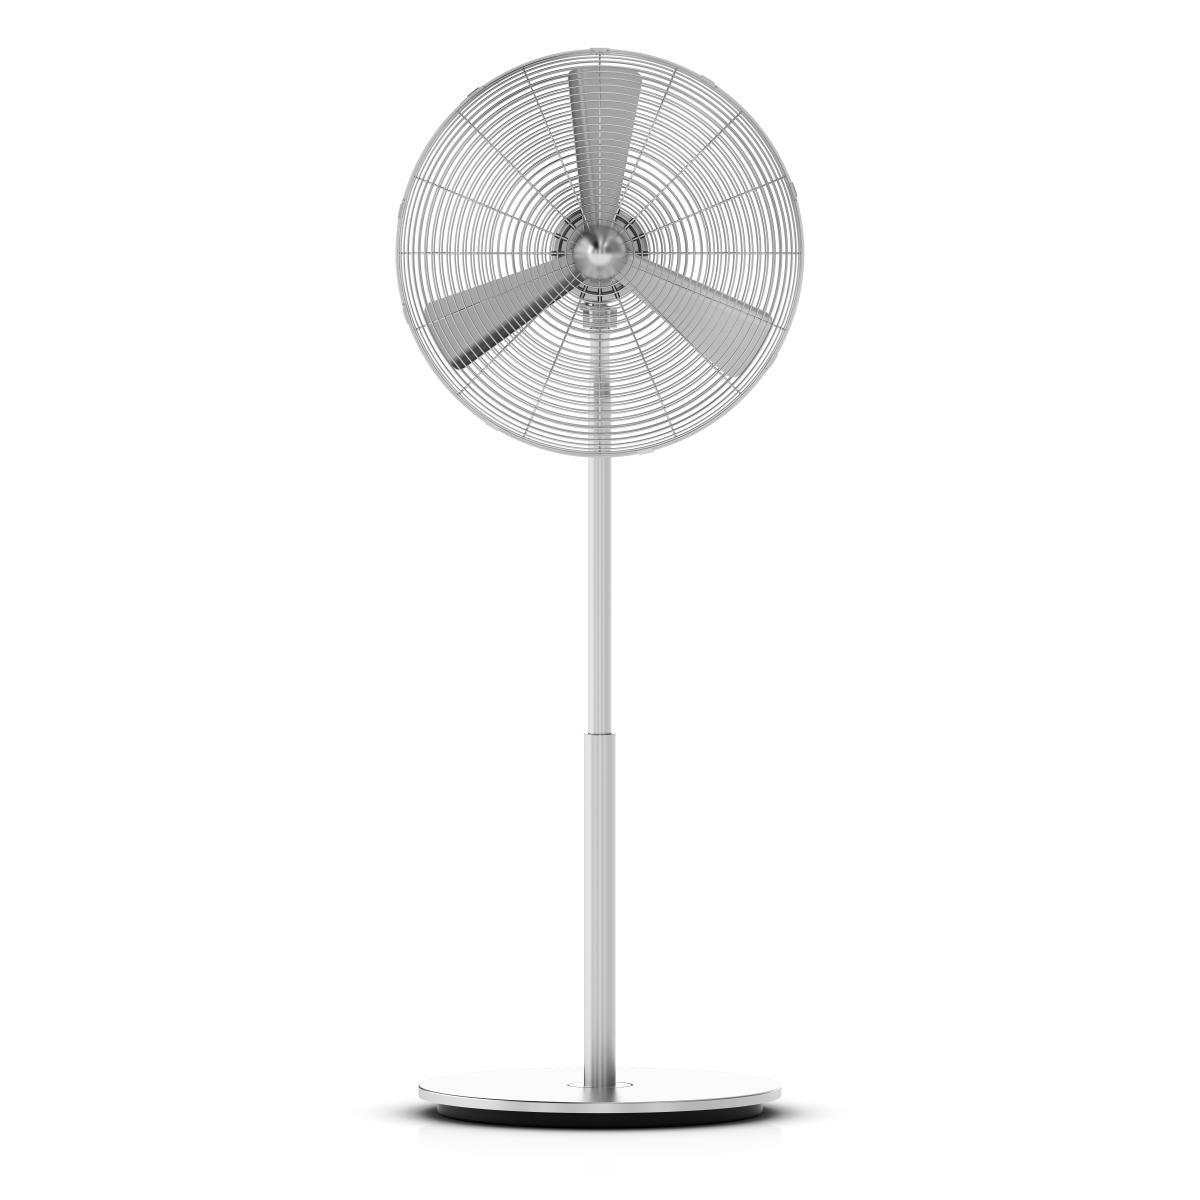 Stand-Ventilator CHARLY nicht oszilierend, verchromt